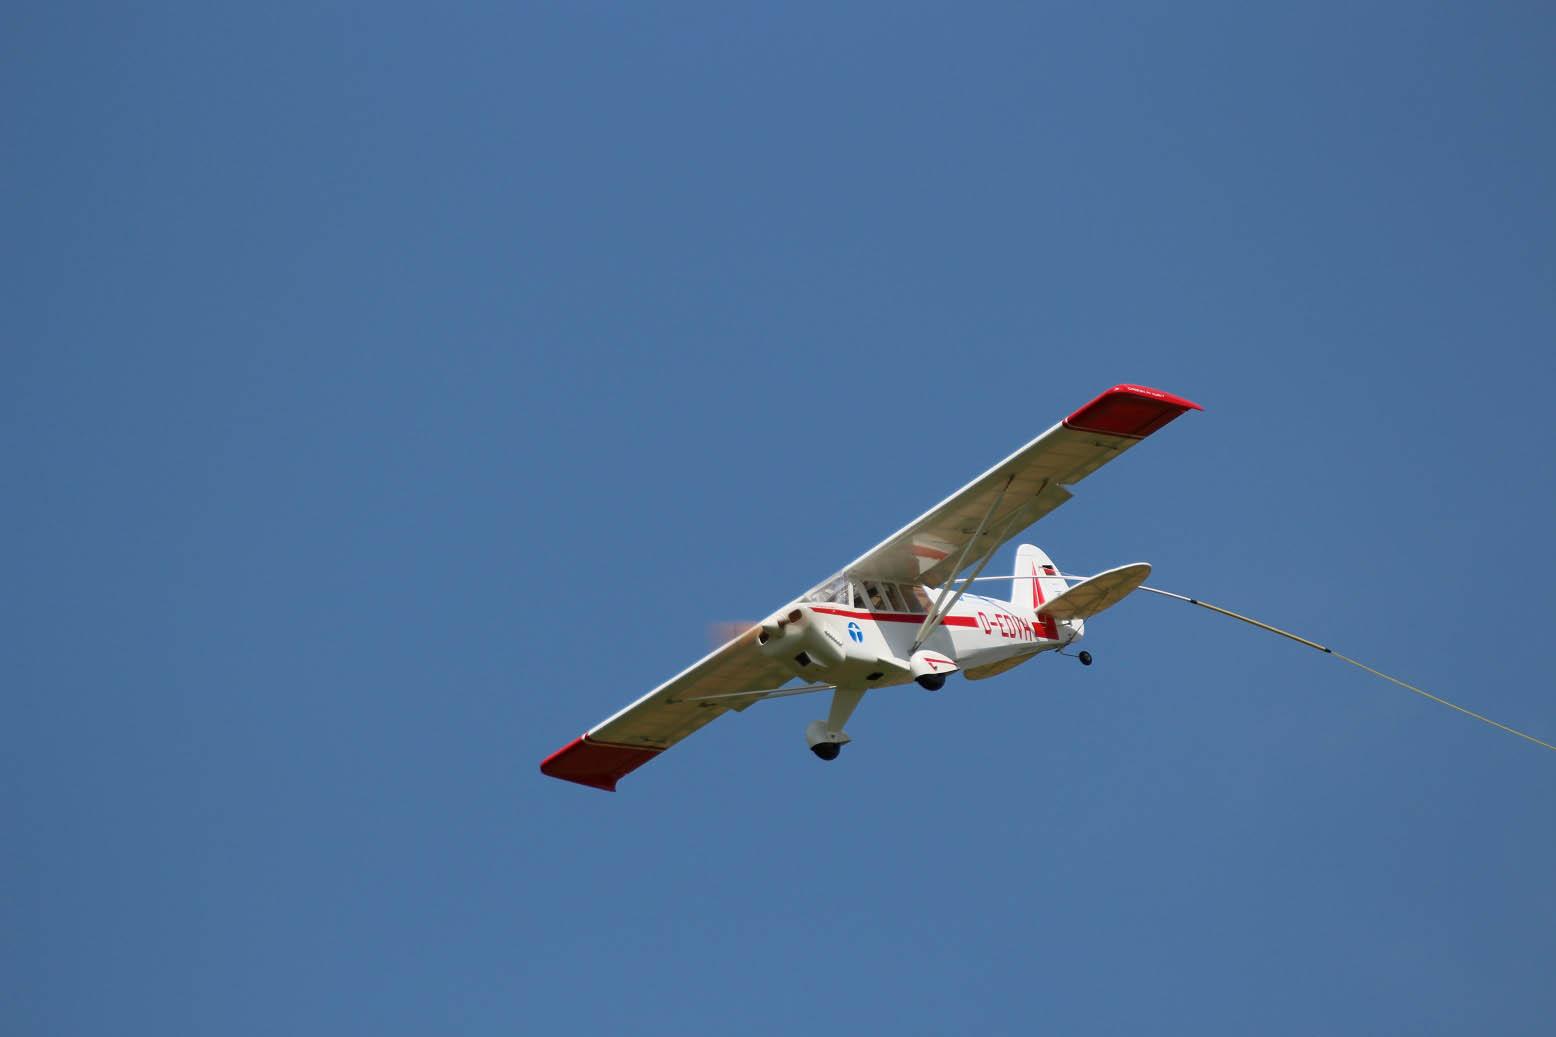 avion radiocommandé